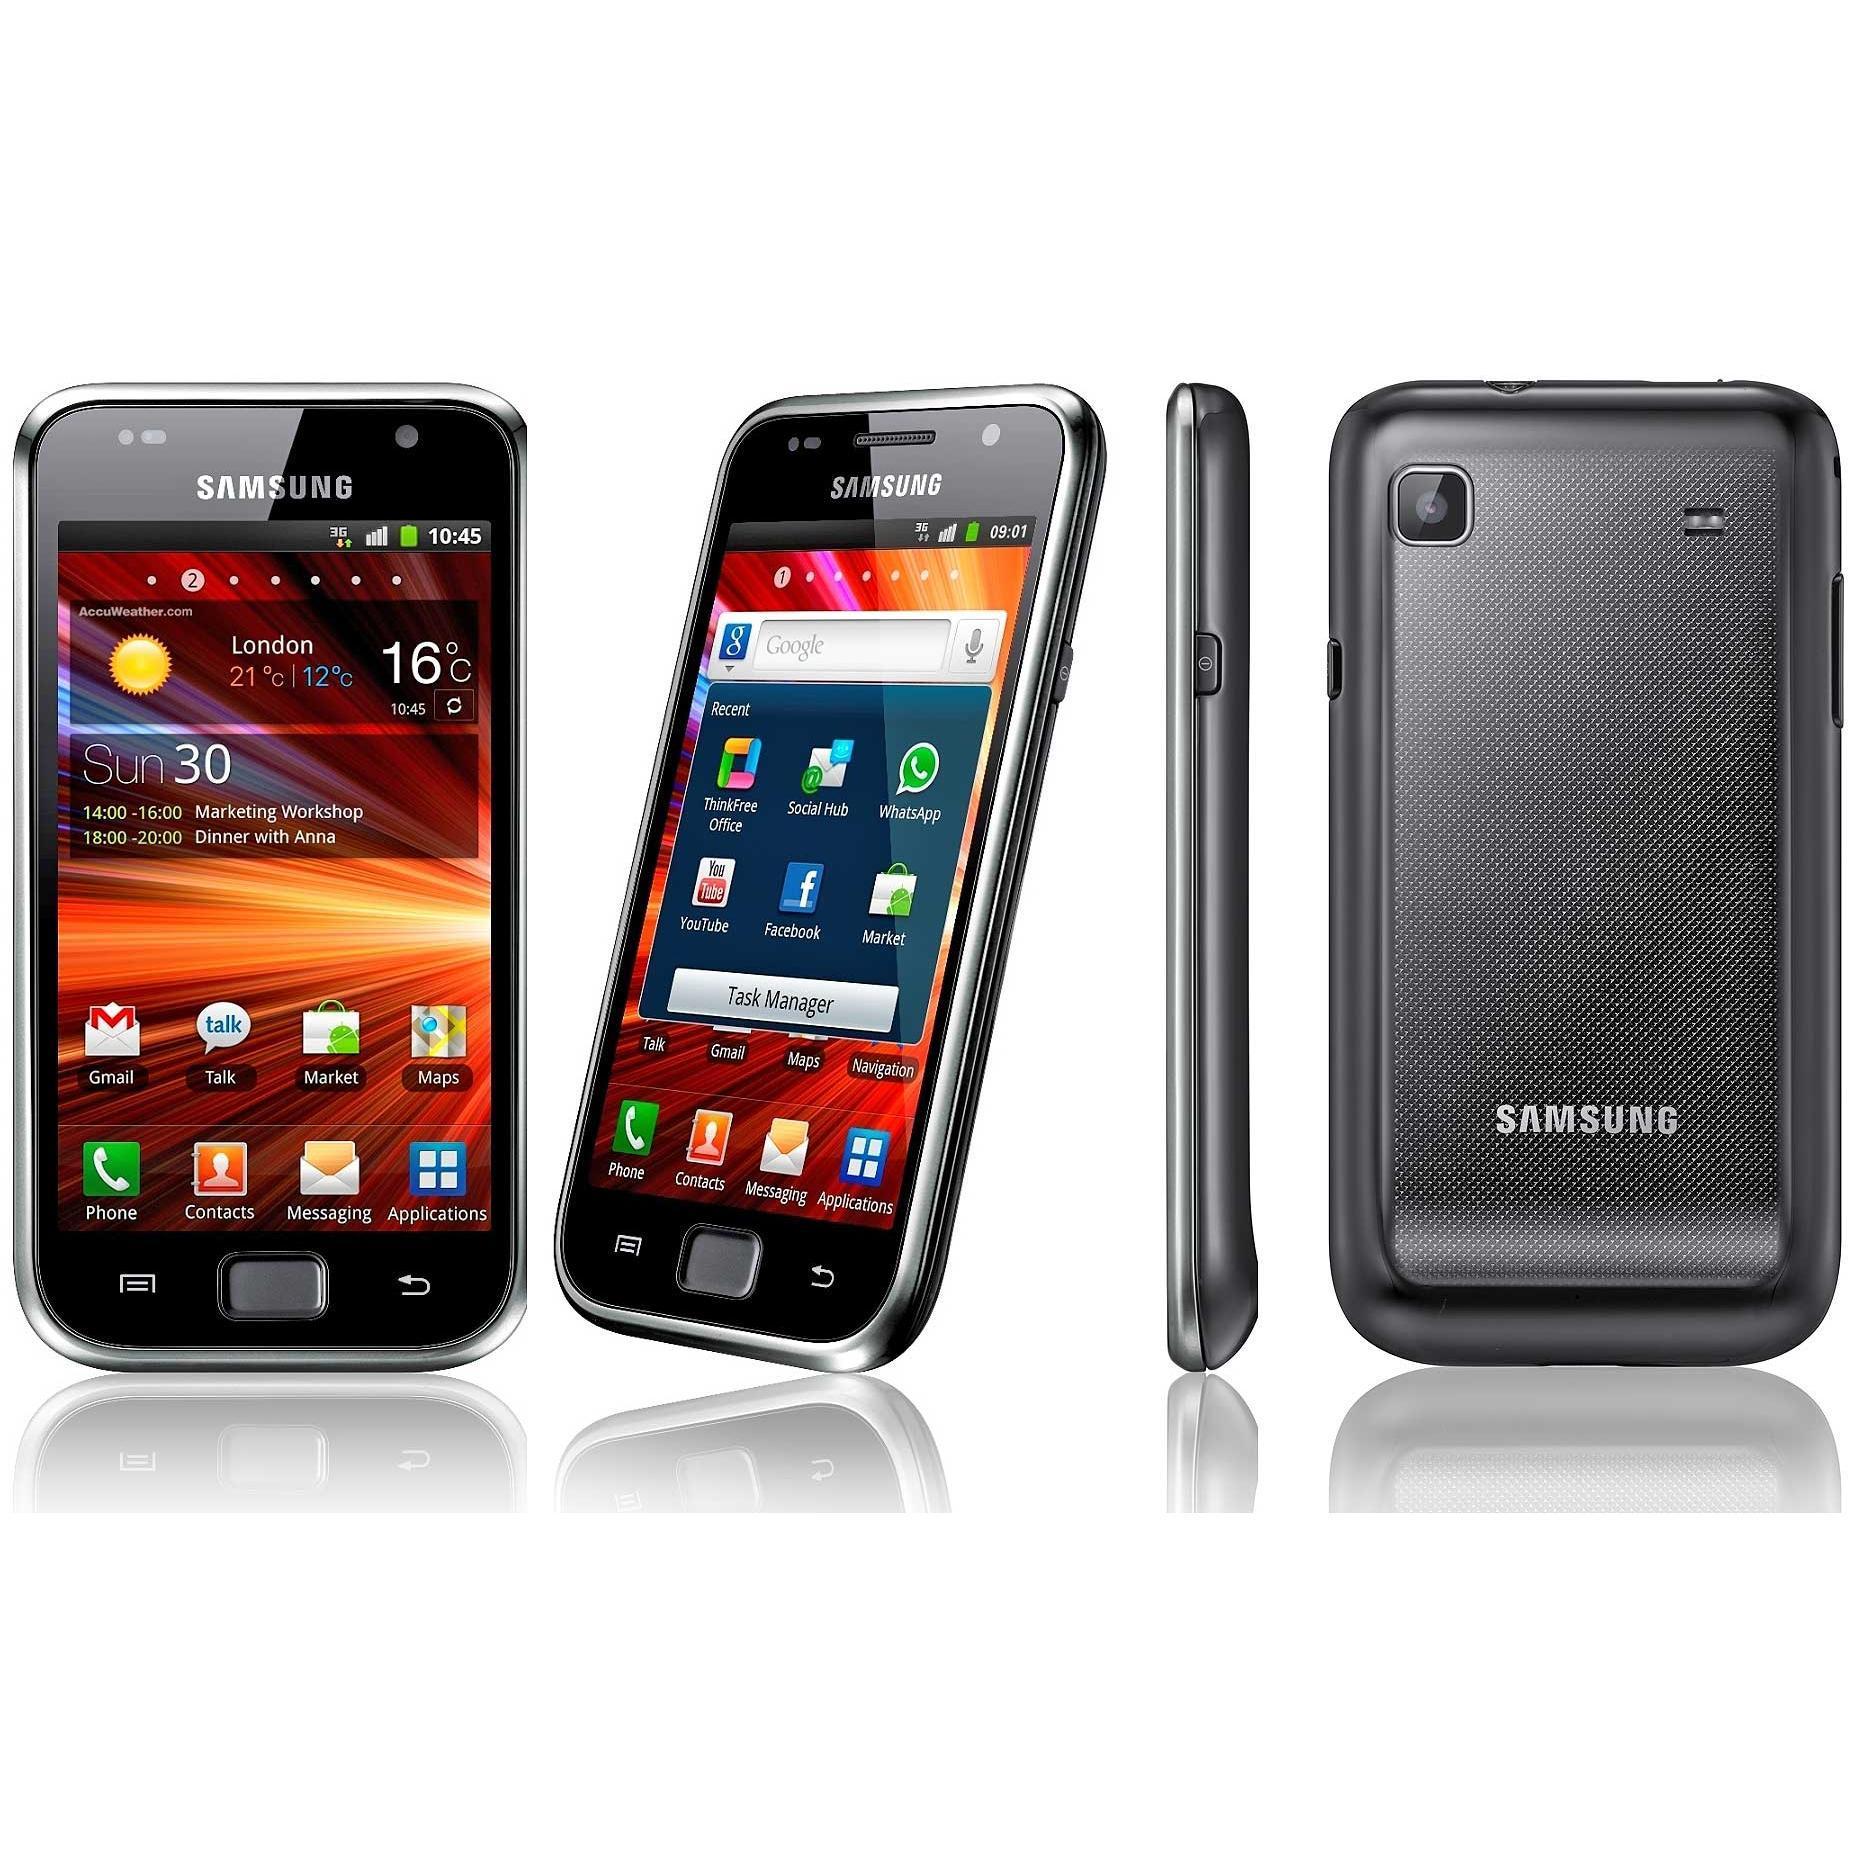 Samsung Galaxy S Plus (GT-I9001) 8GB - Schwarz - Ohne Vertrag